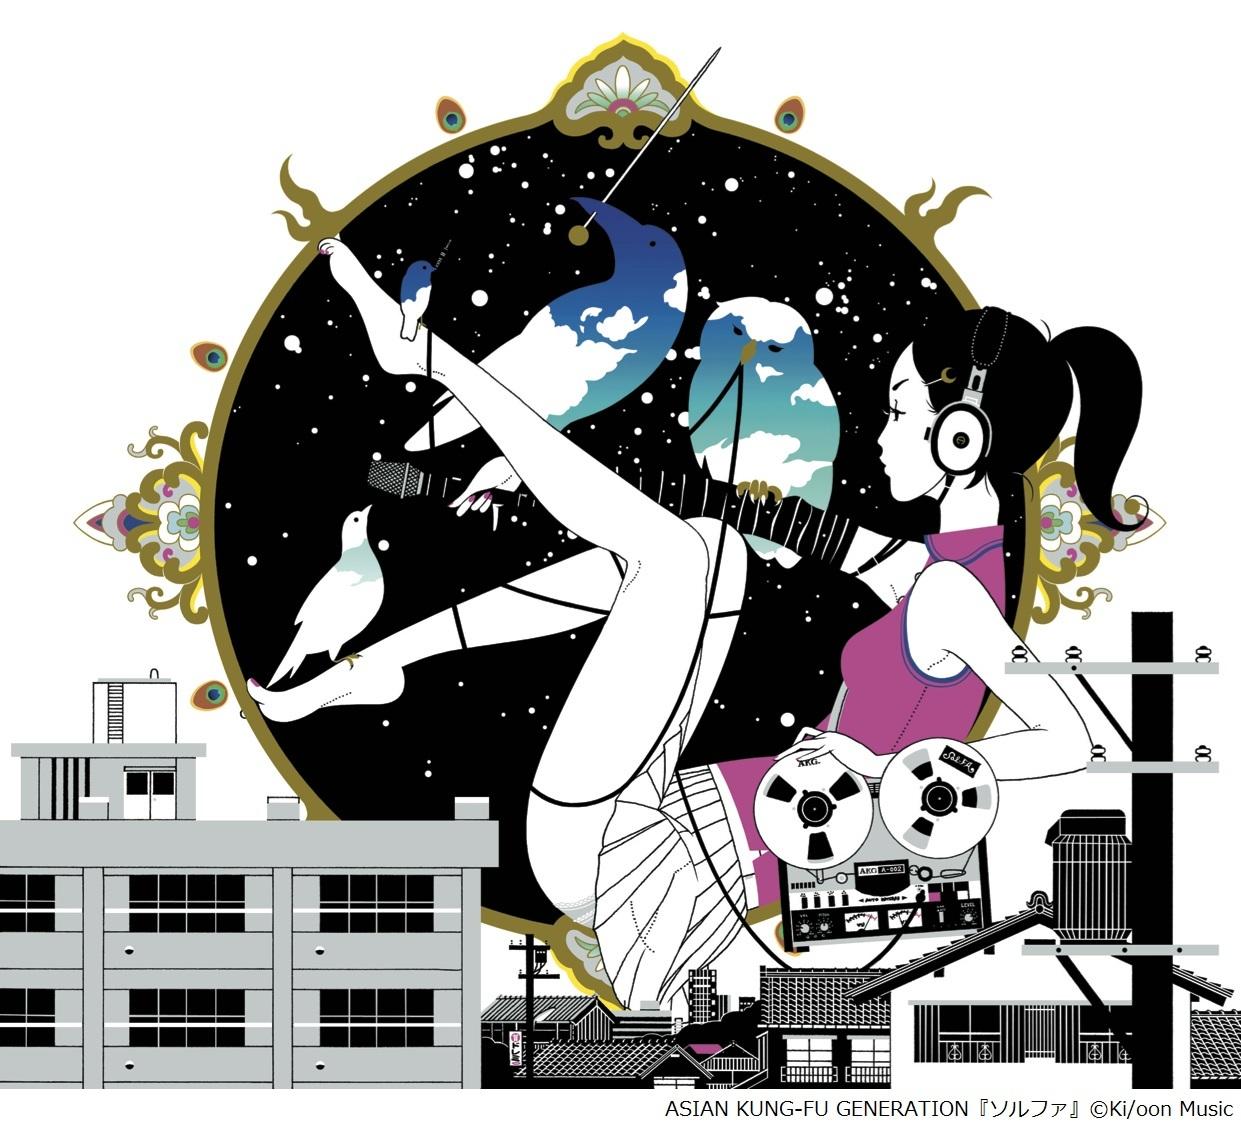 ASIAN KUNG-FU GENERATION 『ソルファ』ⓒKi/oon Music